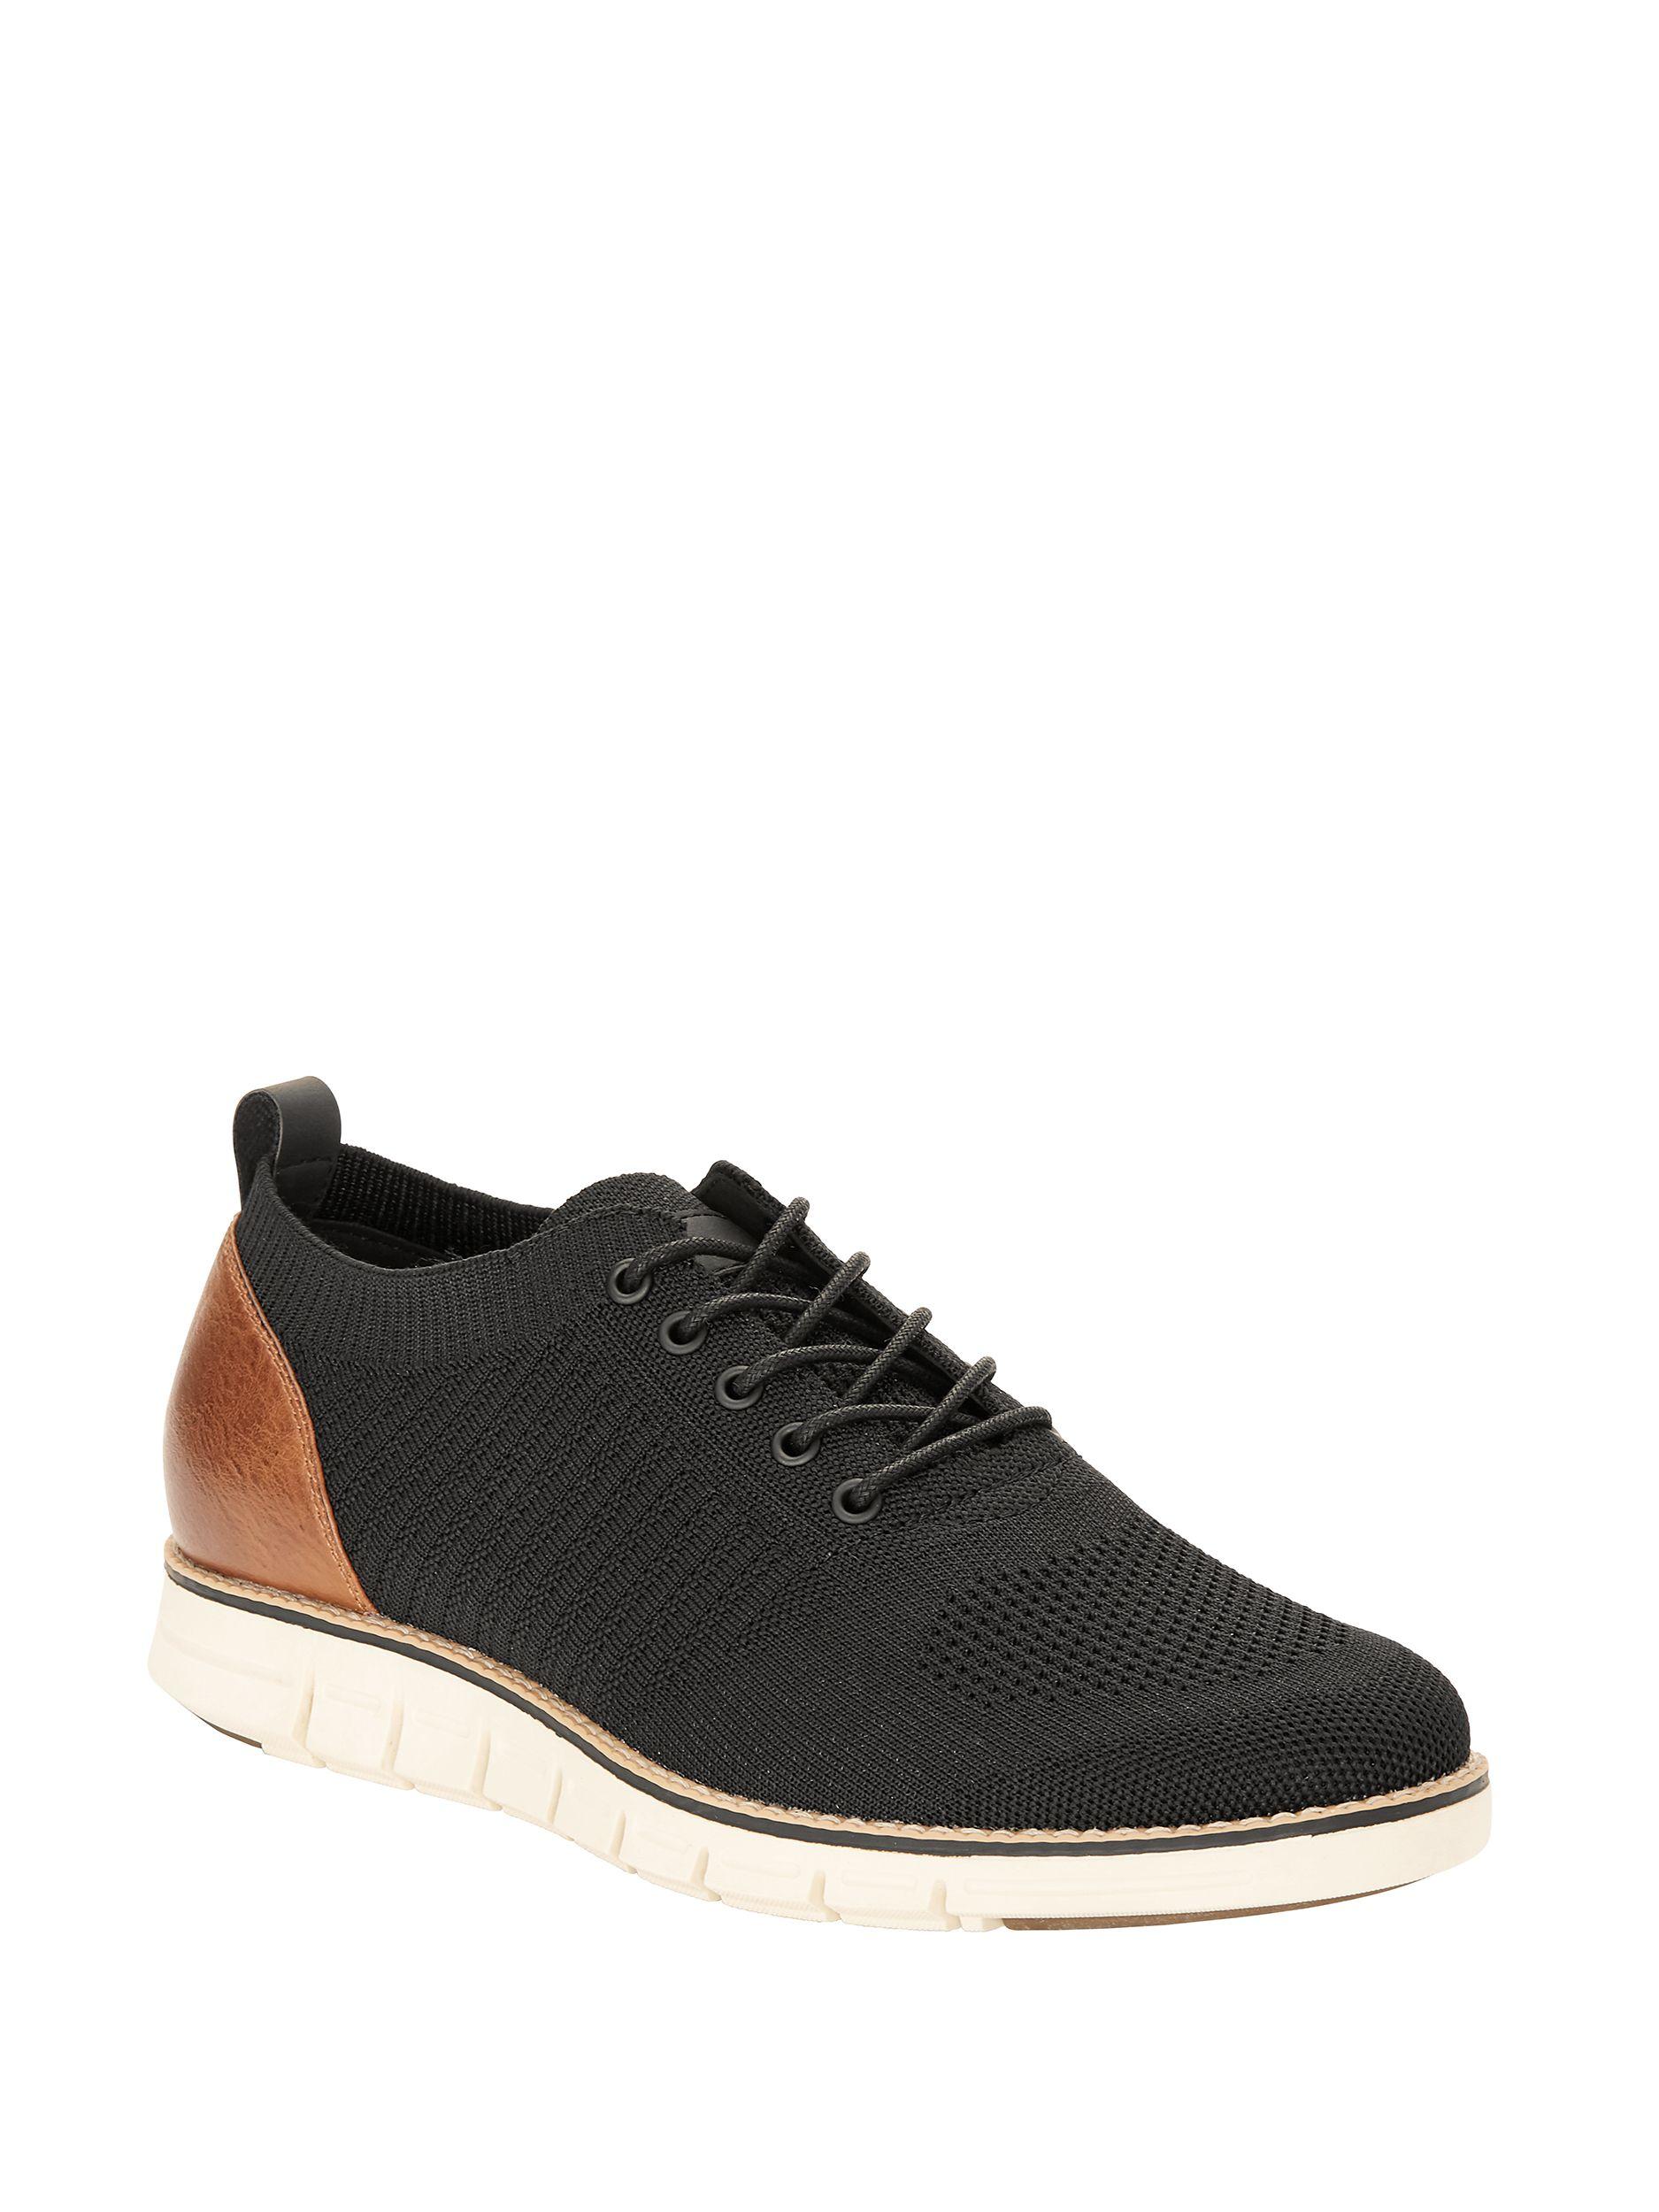 George George Men S Knit Oxford Dress Shoe Walmart Com Dress Shoes Oxford Dress Shoe Men S Knit [ 2500 x 1875 Pixel ]